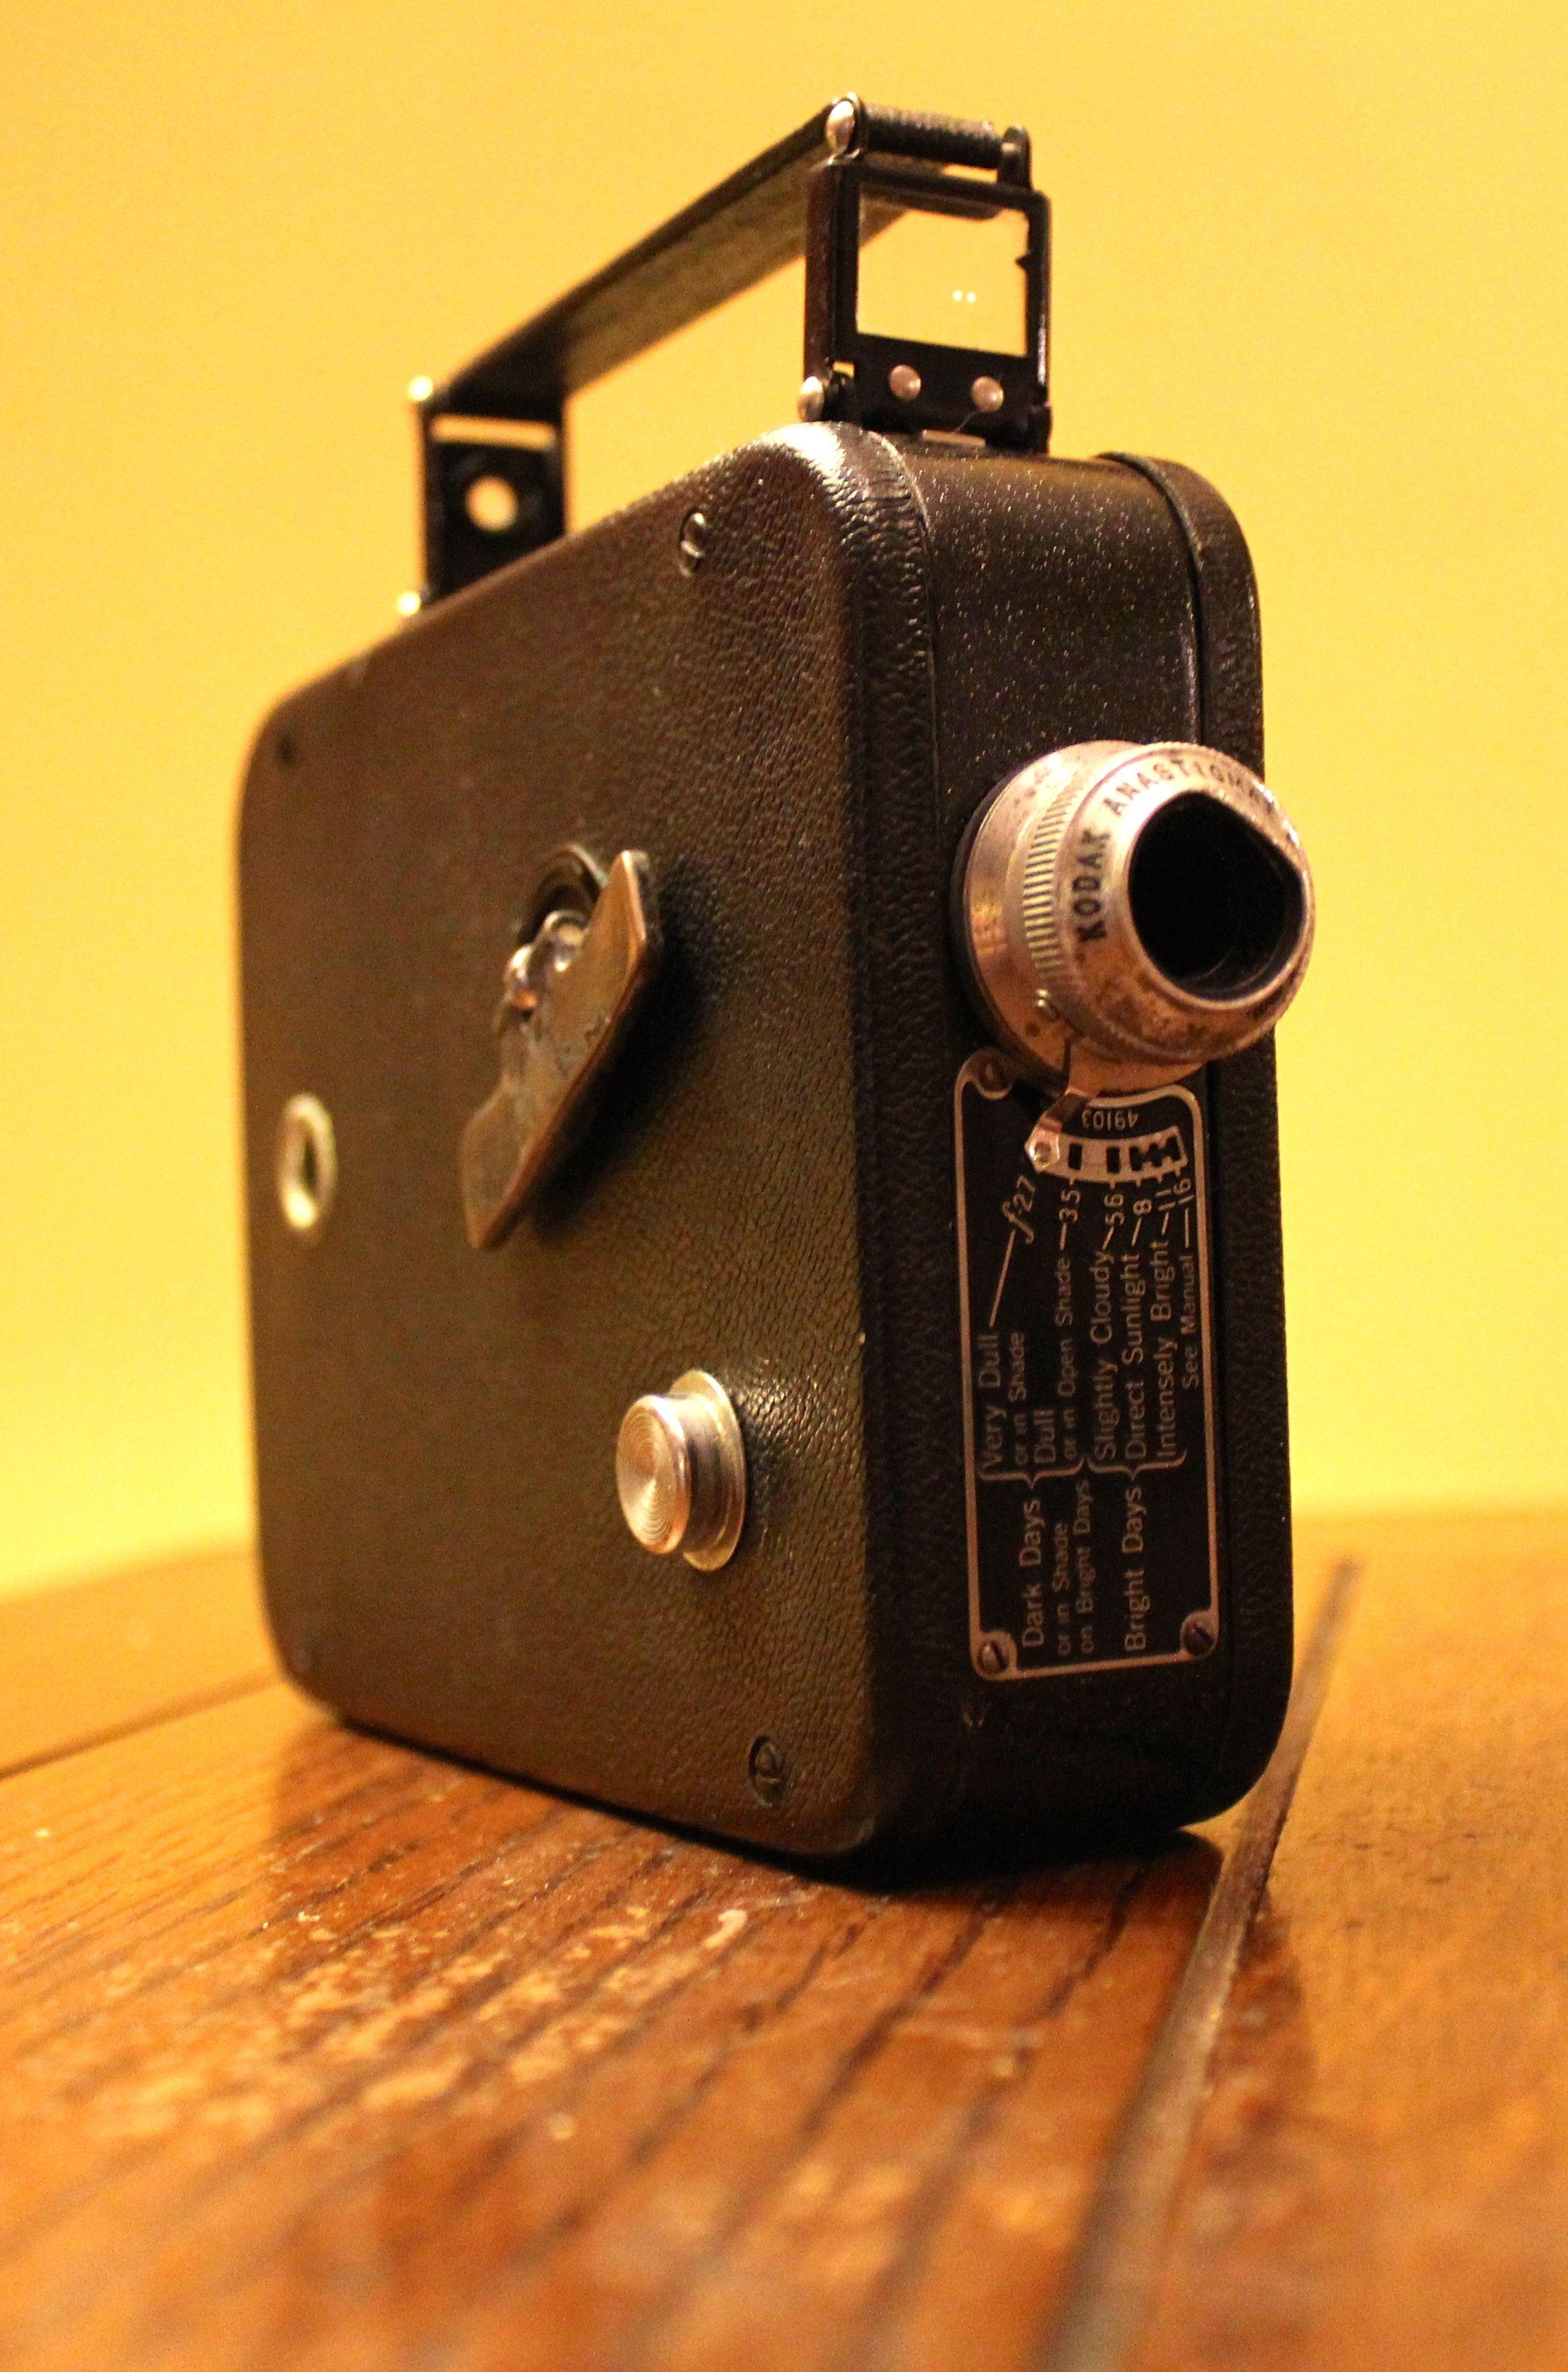 vintage home movie camera cine kodak eight model 25 8mm camera rh pinterest com Largest Cine-Kodak Cine-Kodak 16Mm